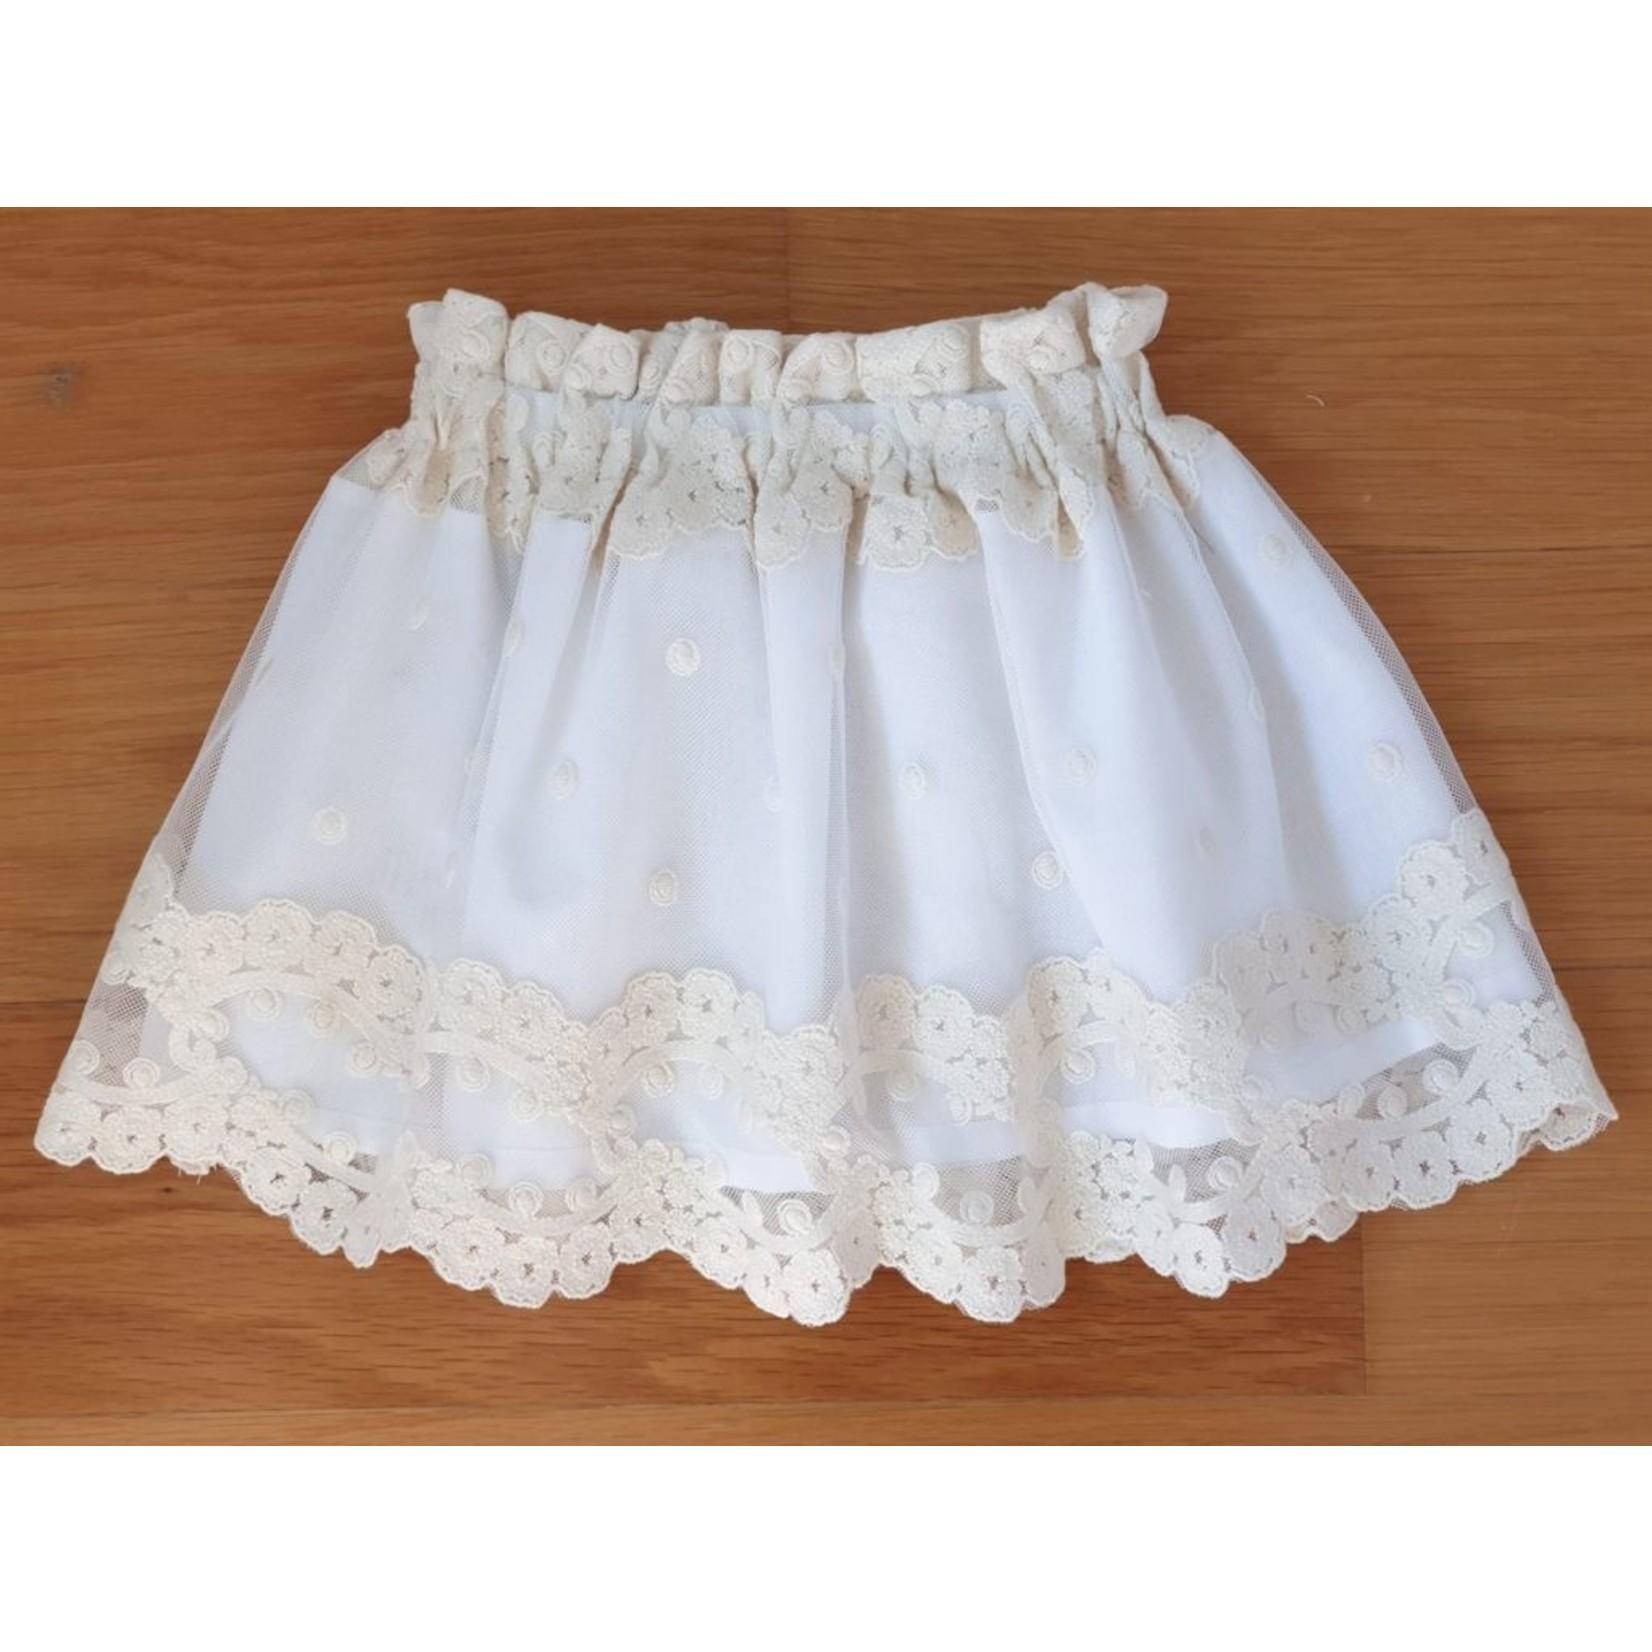 Petite Zara Skirt Ivory Lace - Petite Zara